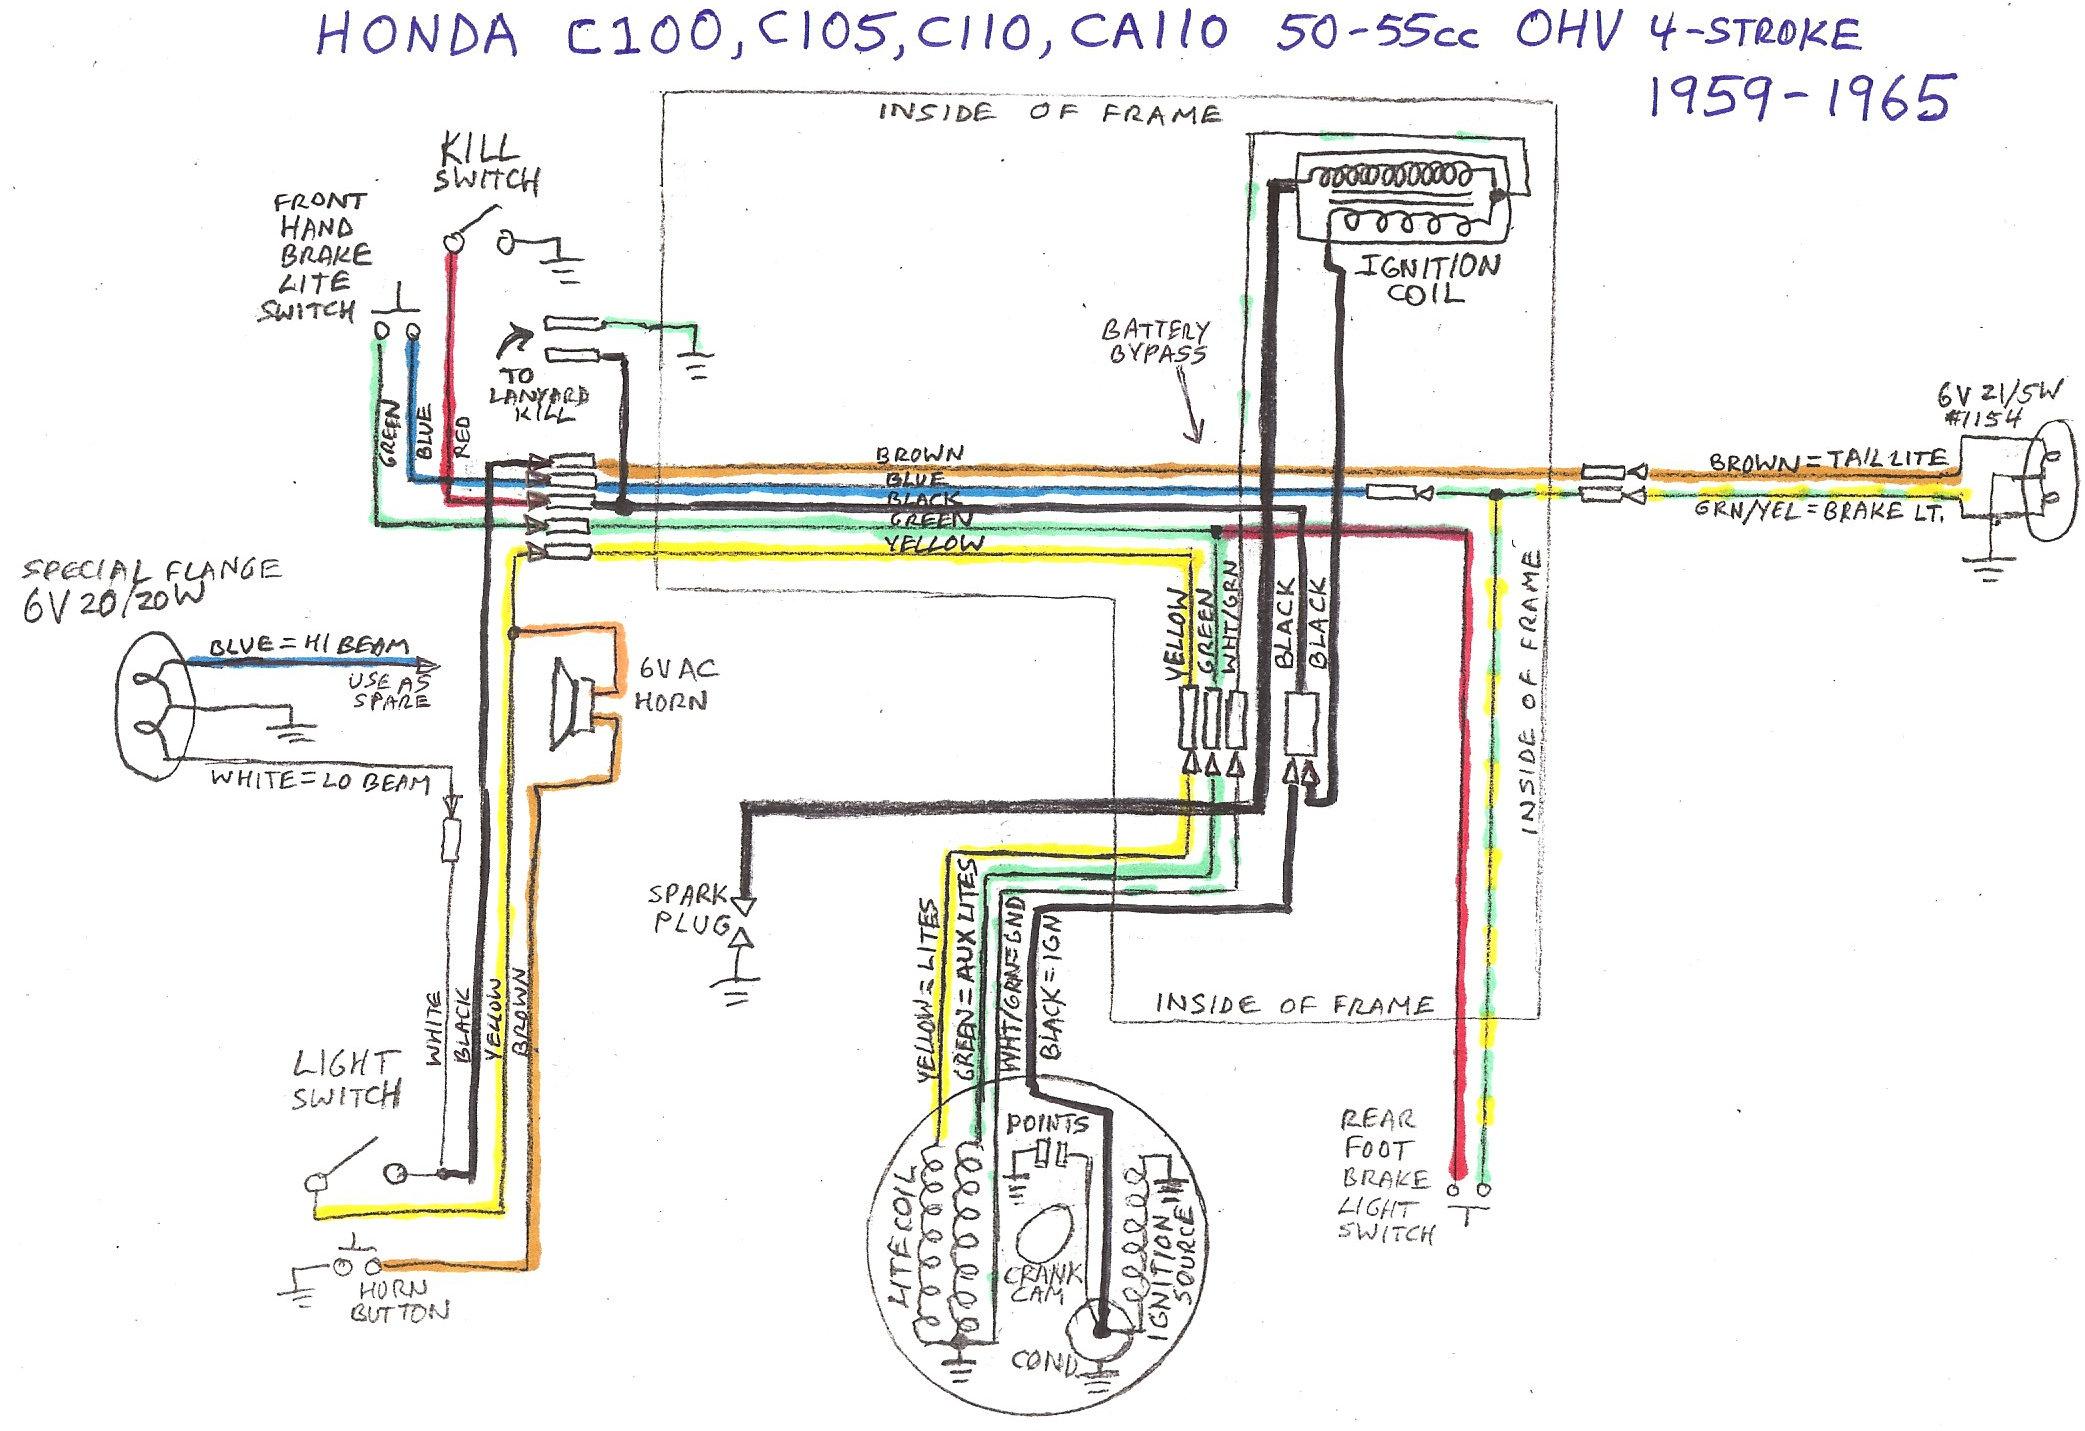 Wiring diagram kelistrikan mio j jzgreentown wiring diagram kelistrikan mio j choice image wiring asfbconference2016 Images